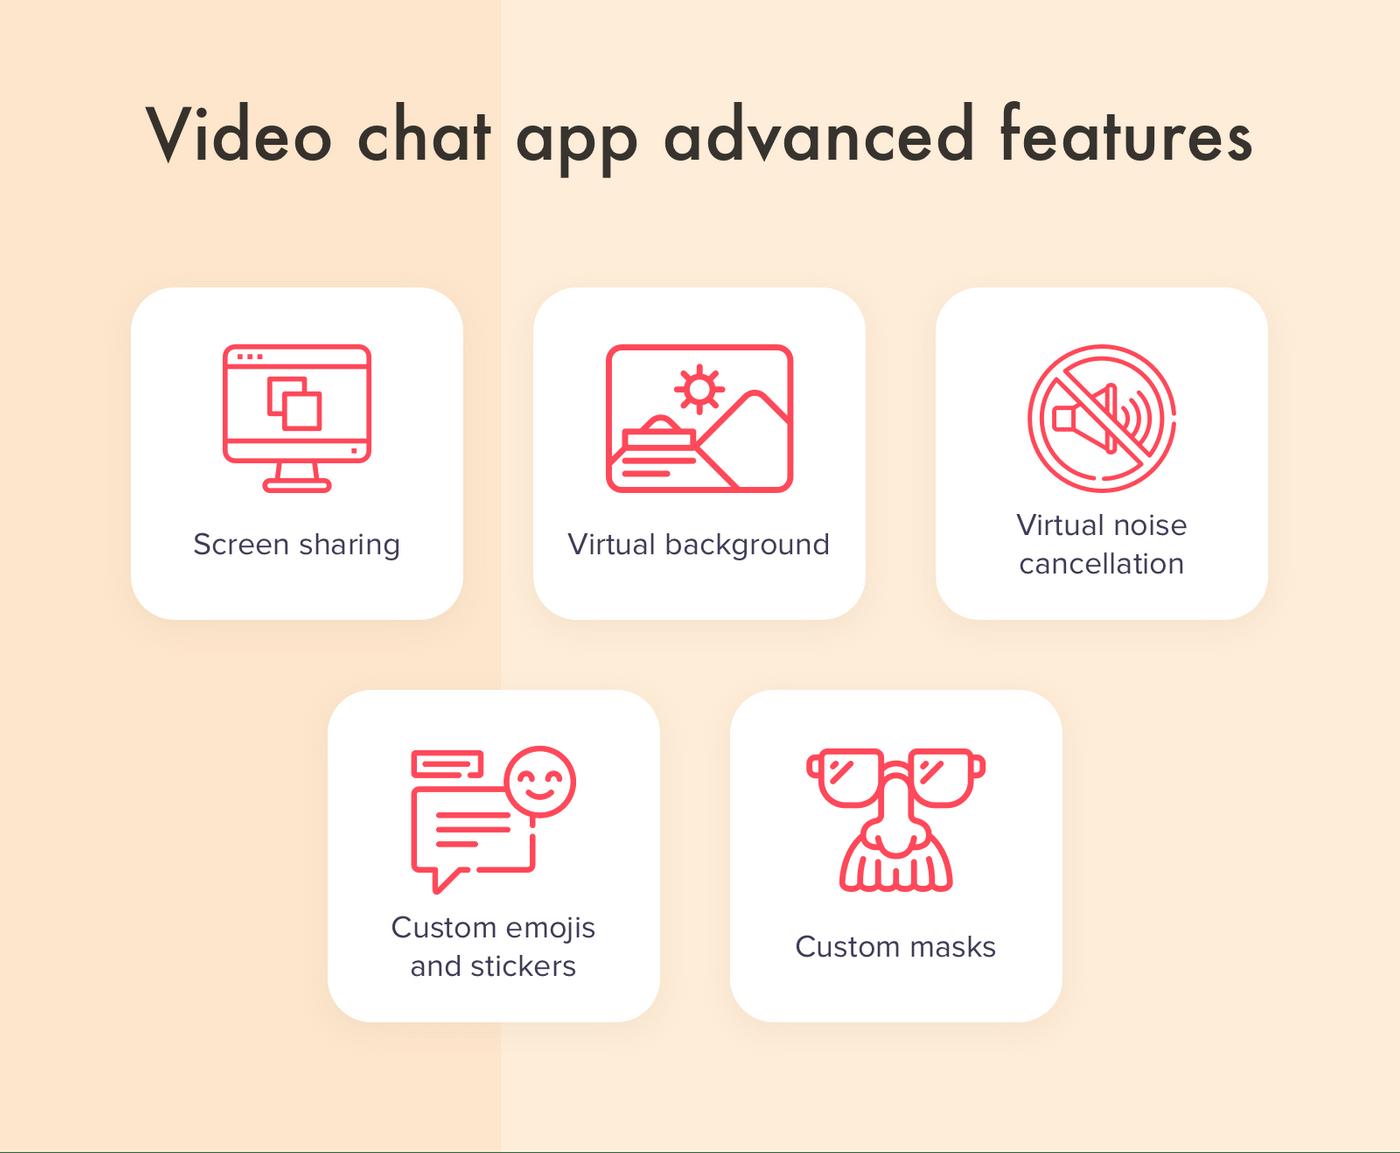 Video chat app development: advanced features